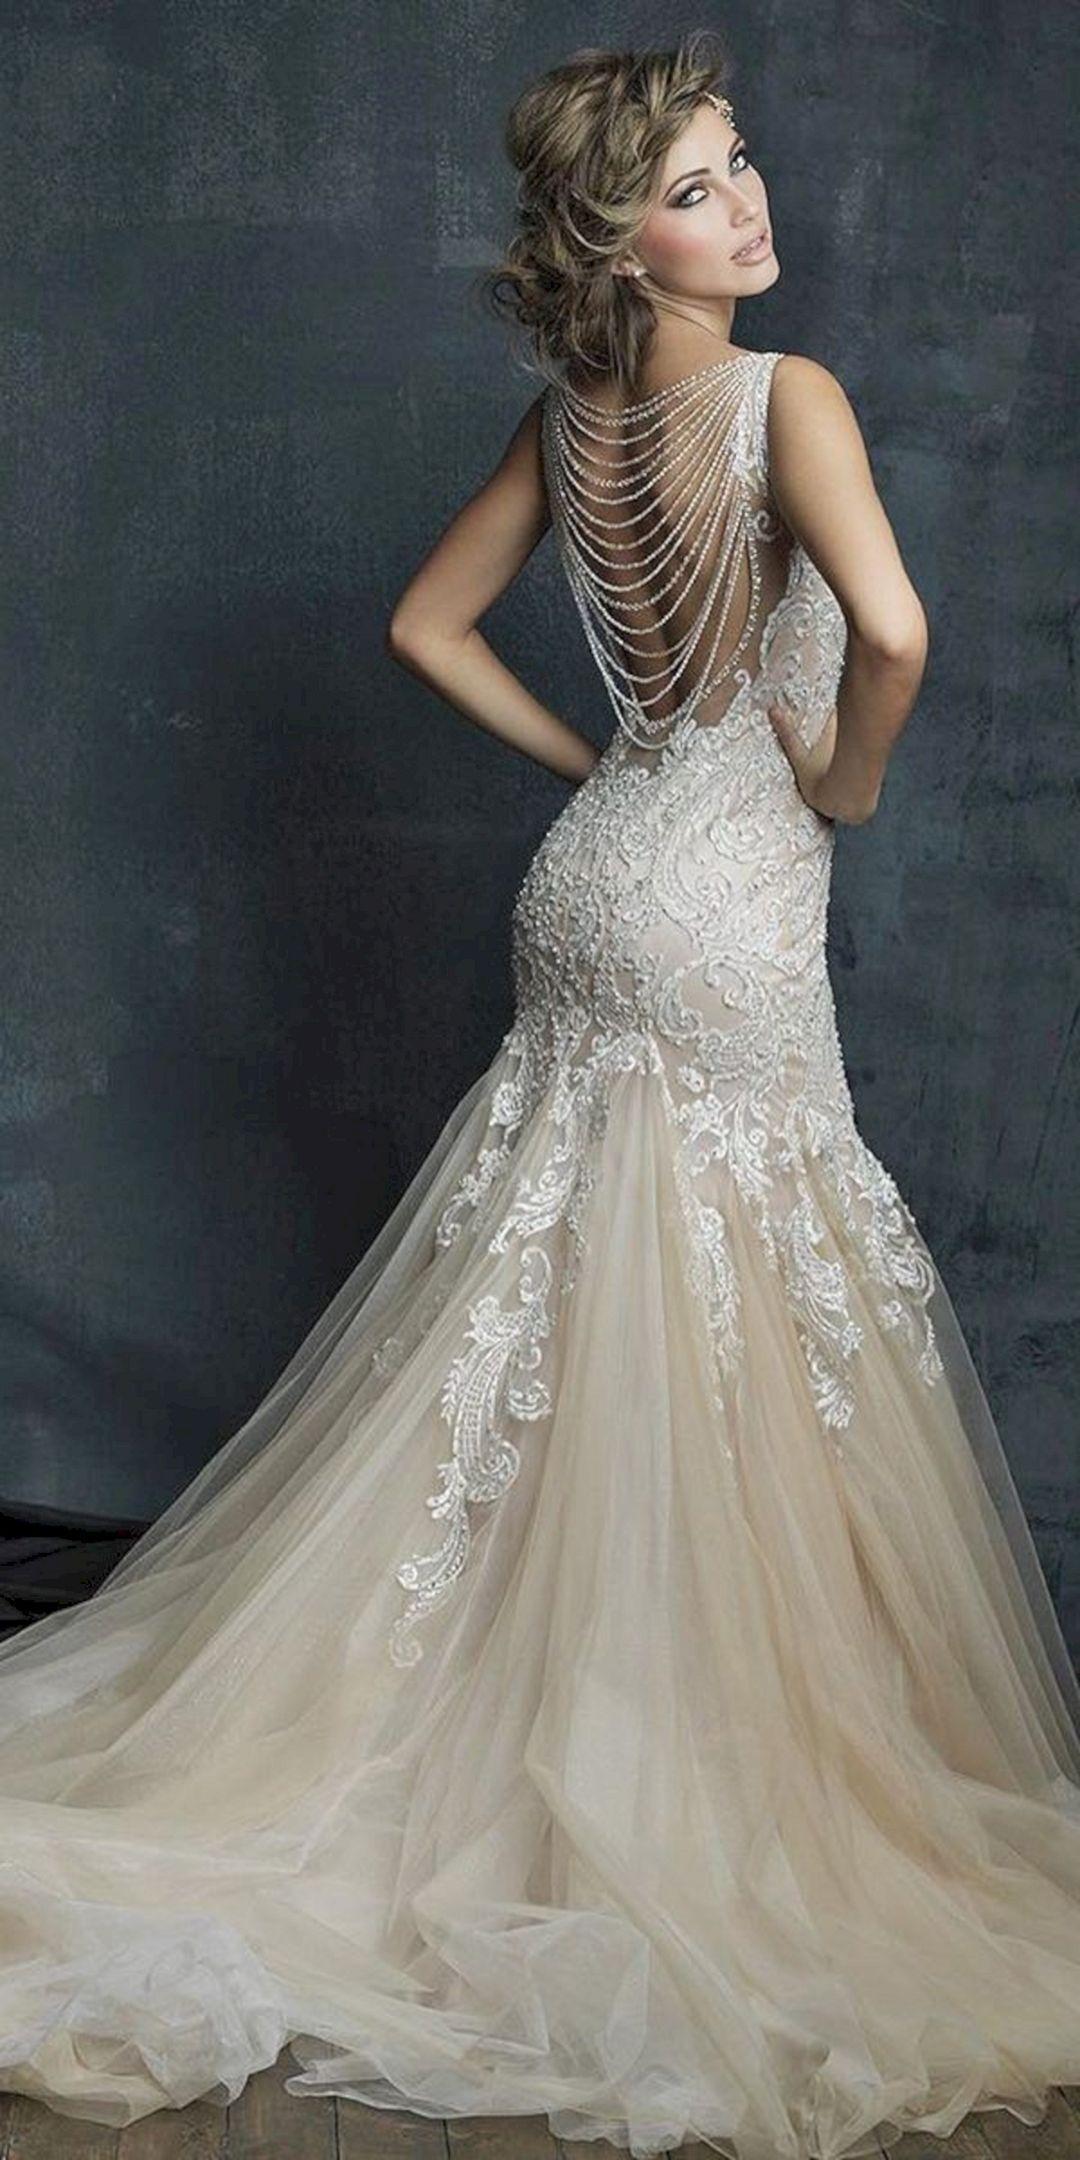 Beautiful Classic Wedding Dresses 21: Vintage Glam Wedding Dresses At Reisefeber.org